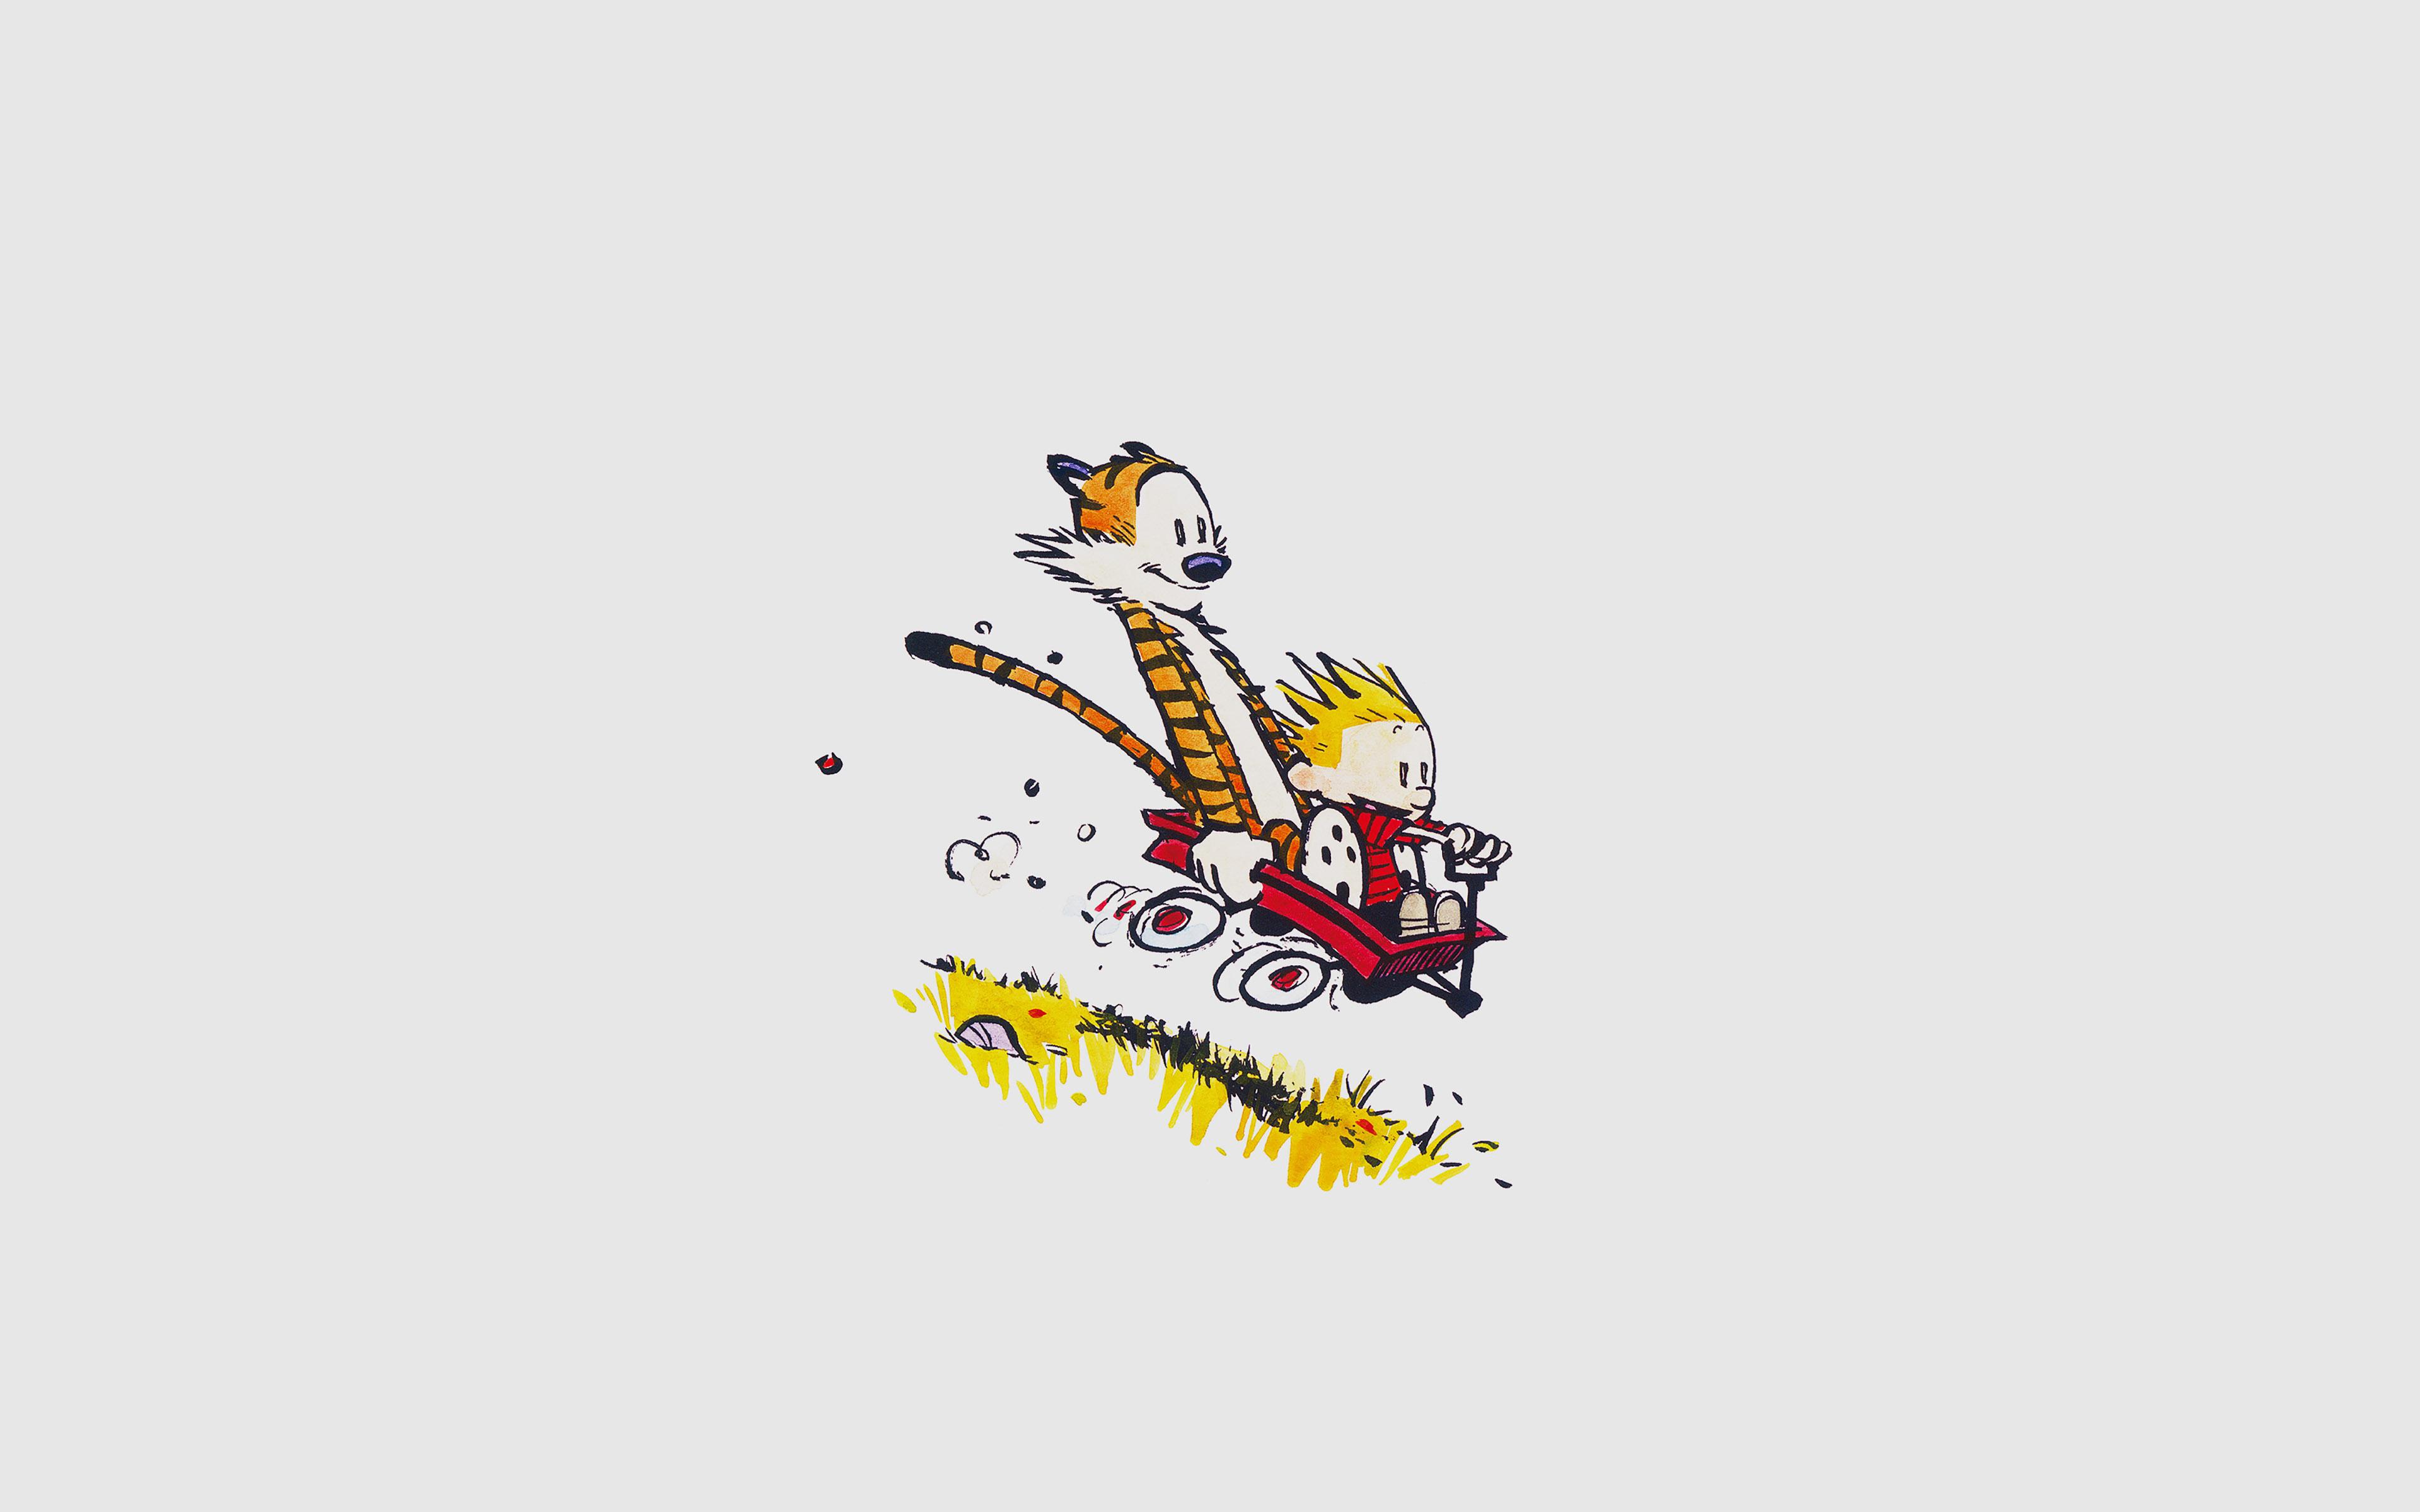 Cartoon Fall Wallpaper Af62 Calvin Hobbes Happy Times Cartoon Wallpaper